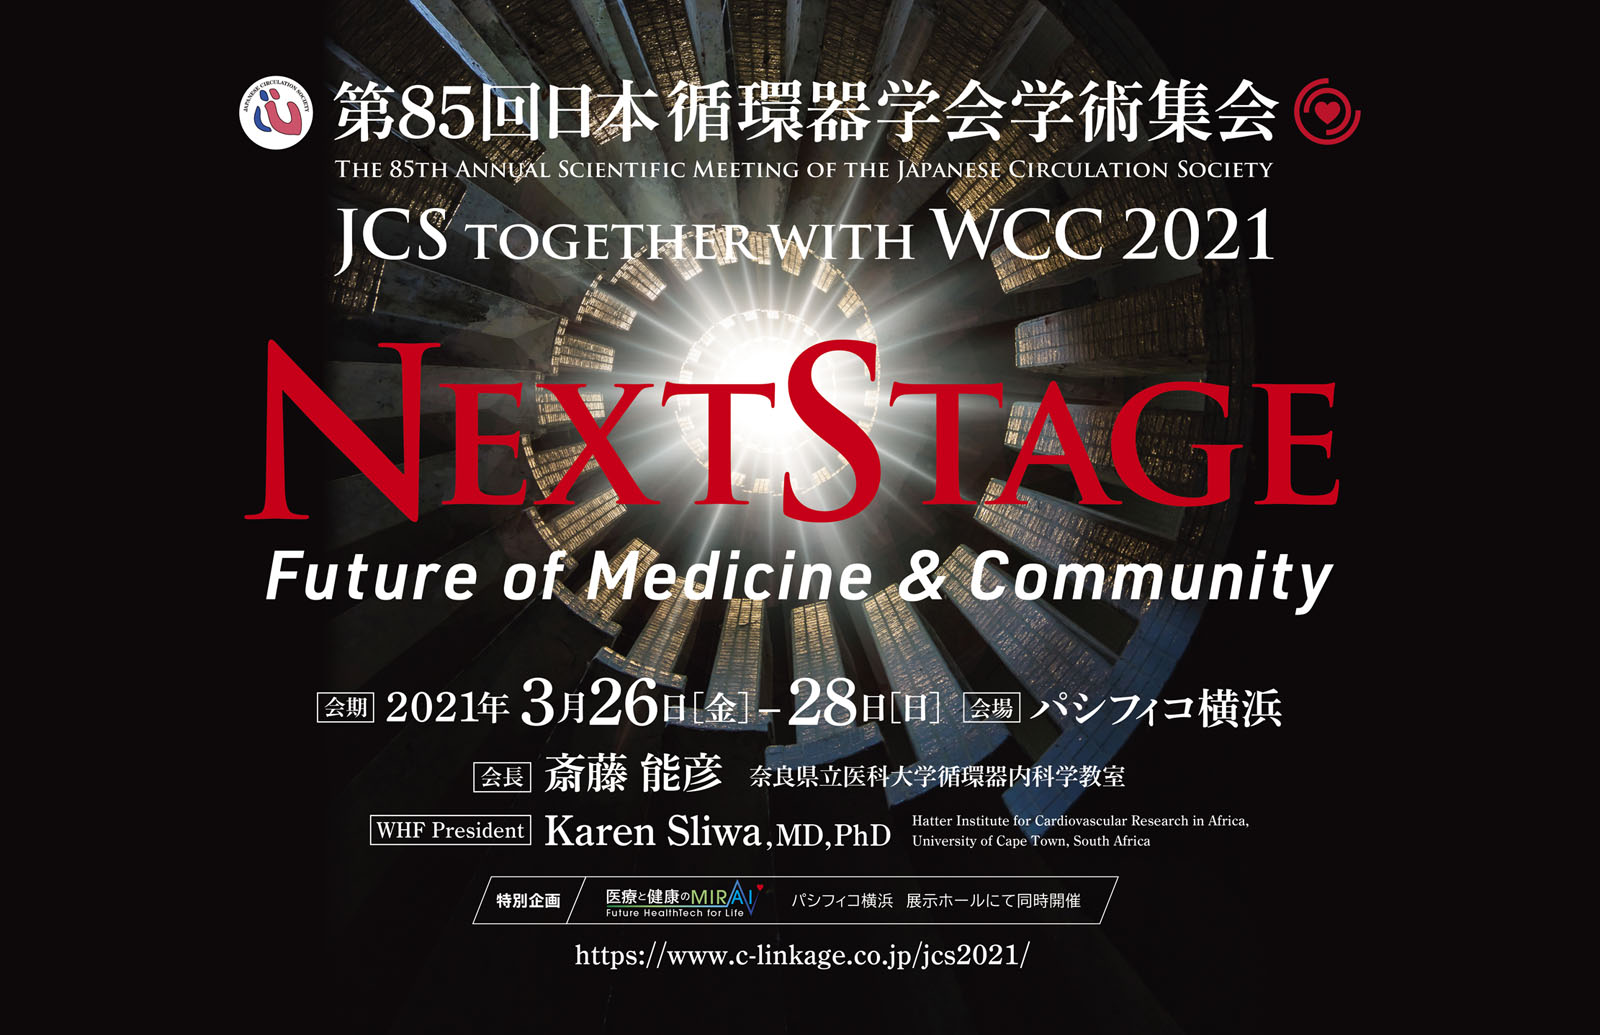 JCS2021・WCC2021学術集会